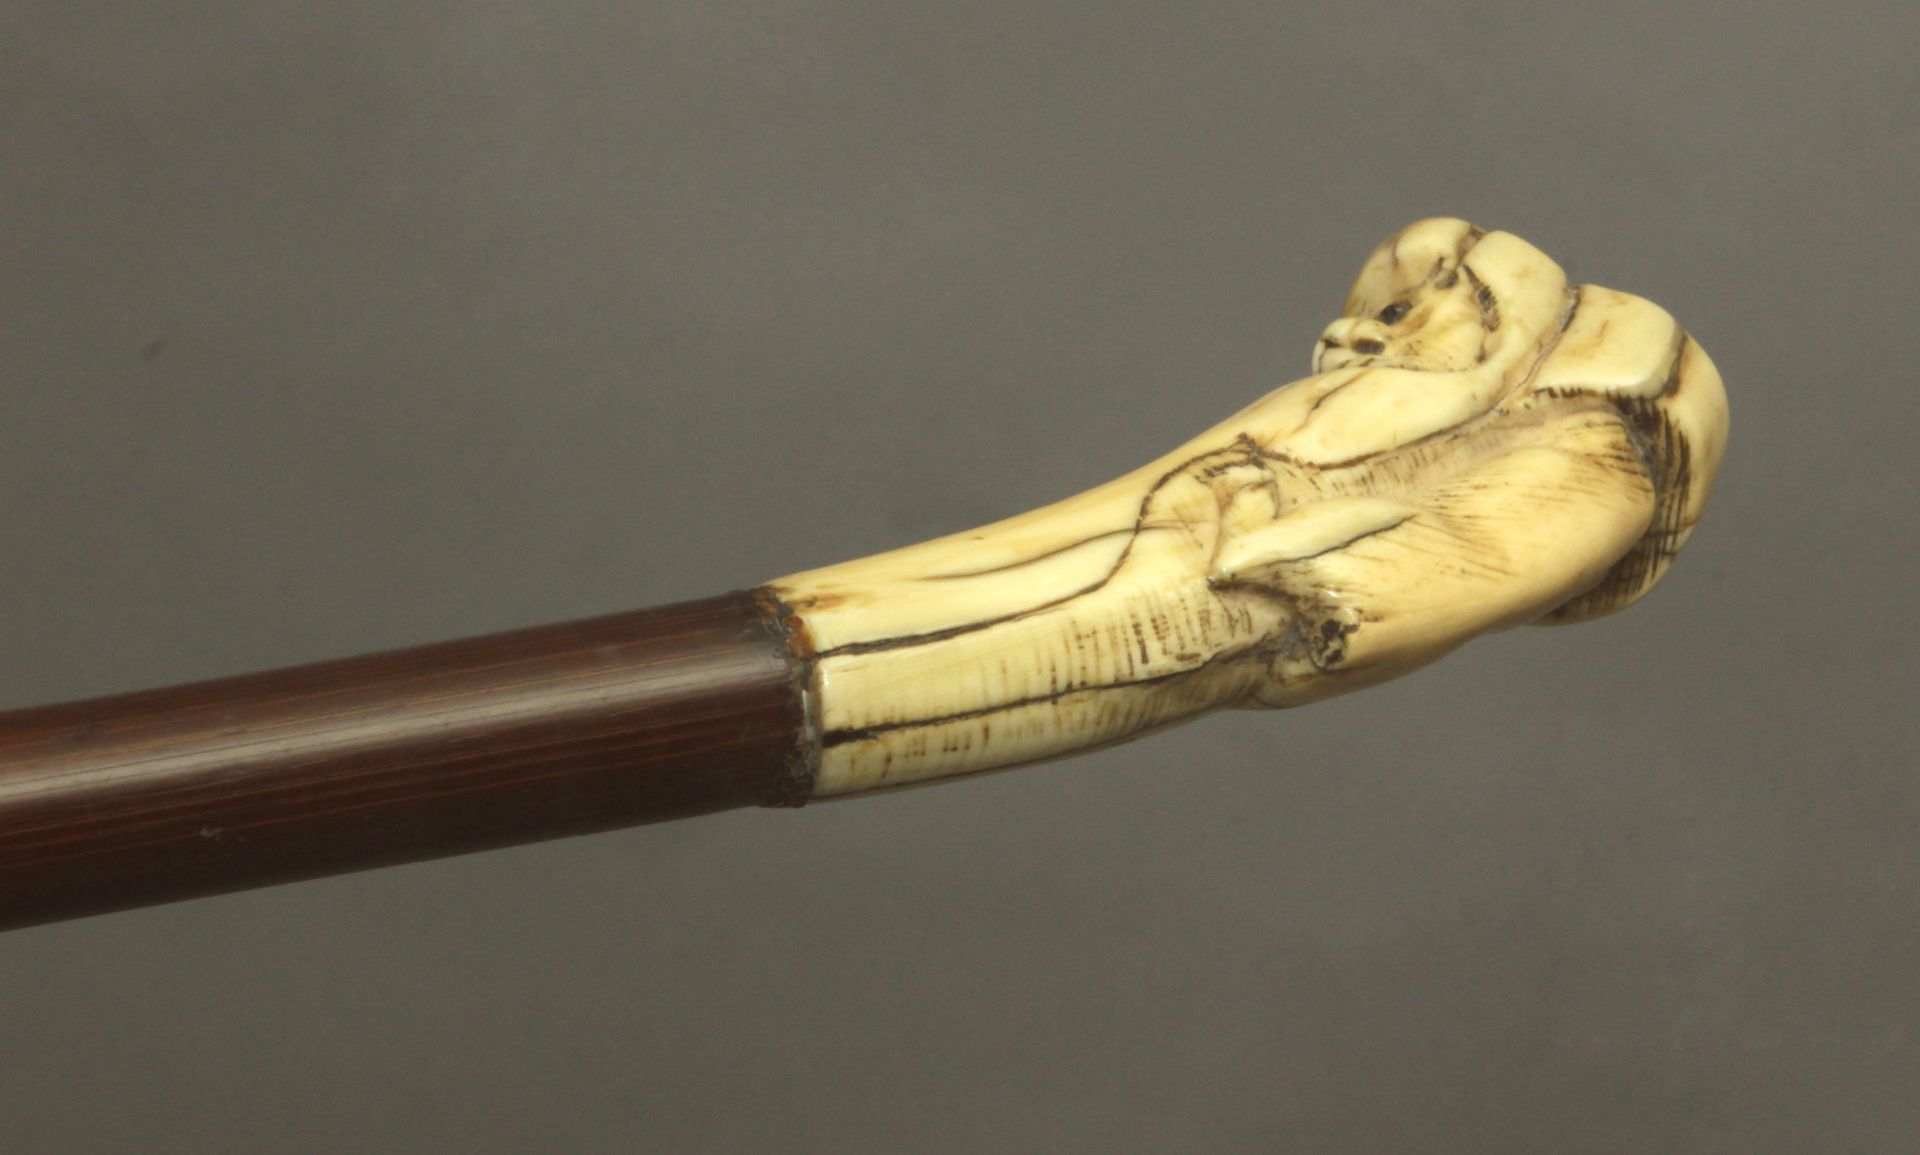 A 19th century ivory handled walking stick - Bild 4 aus 9